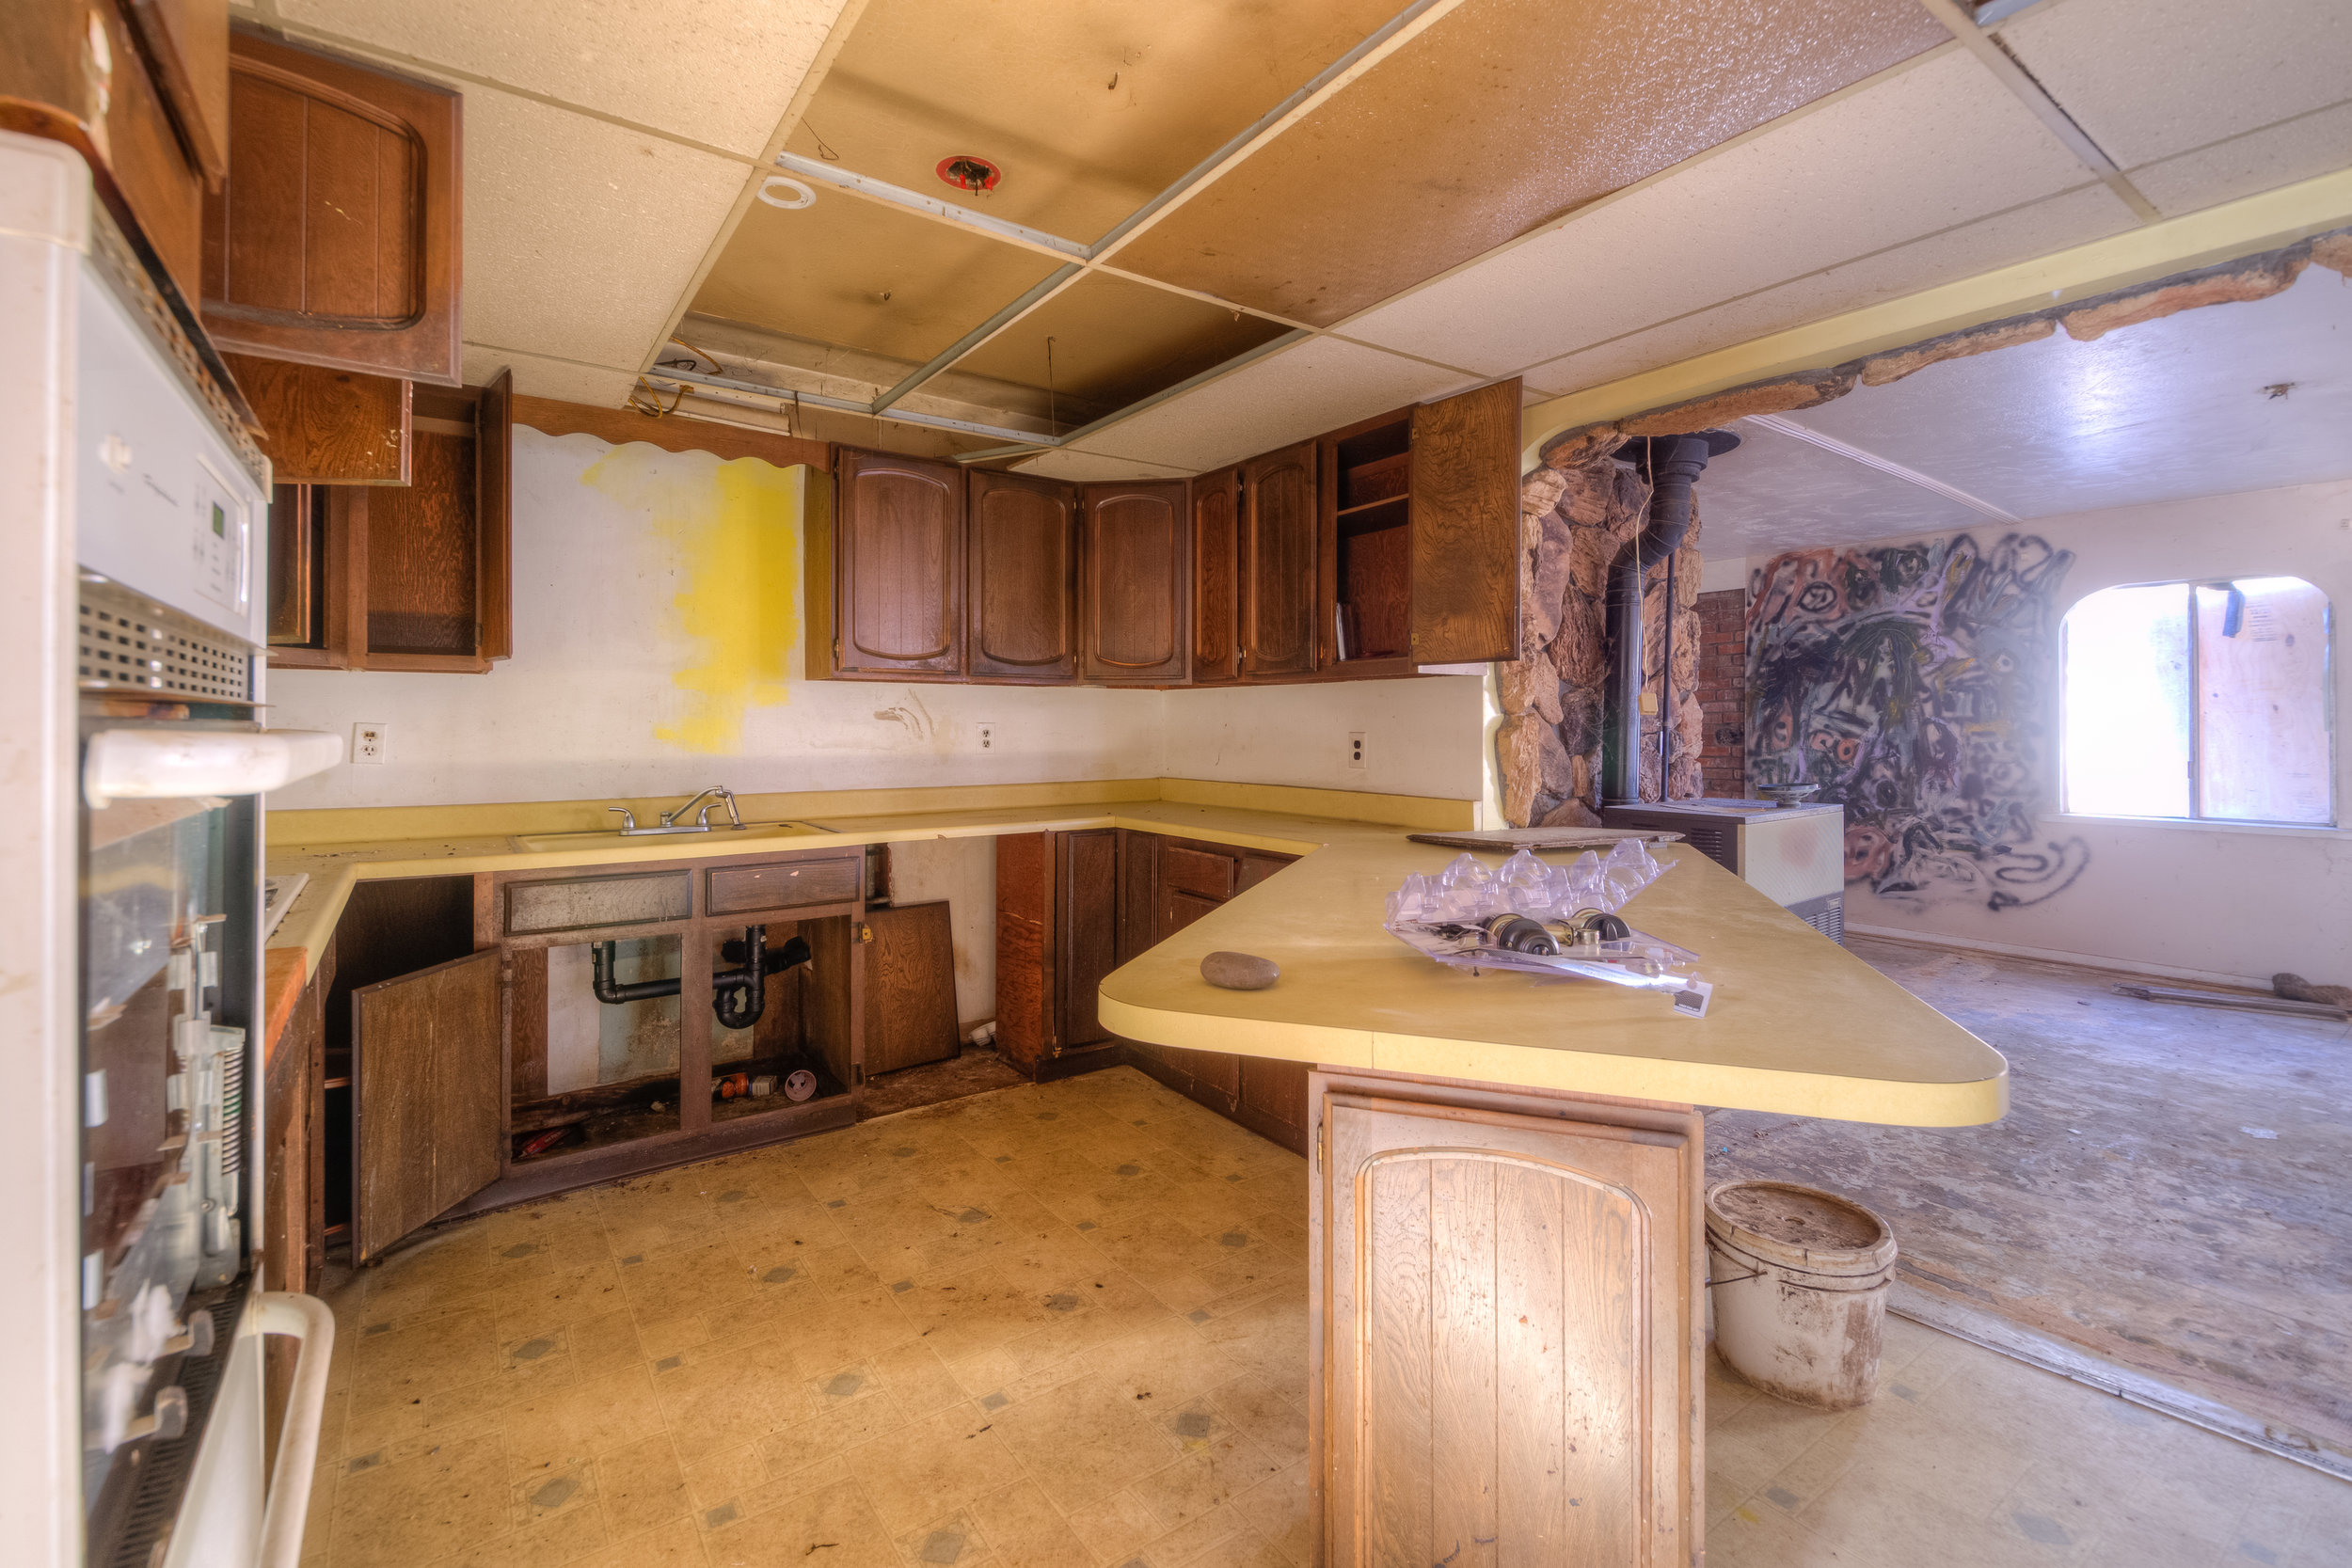 920 Neal Dow Ave 012 Kitchen.jpg